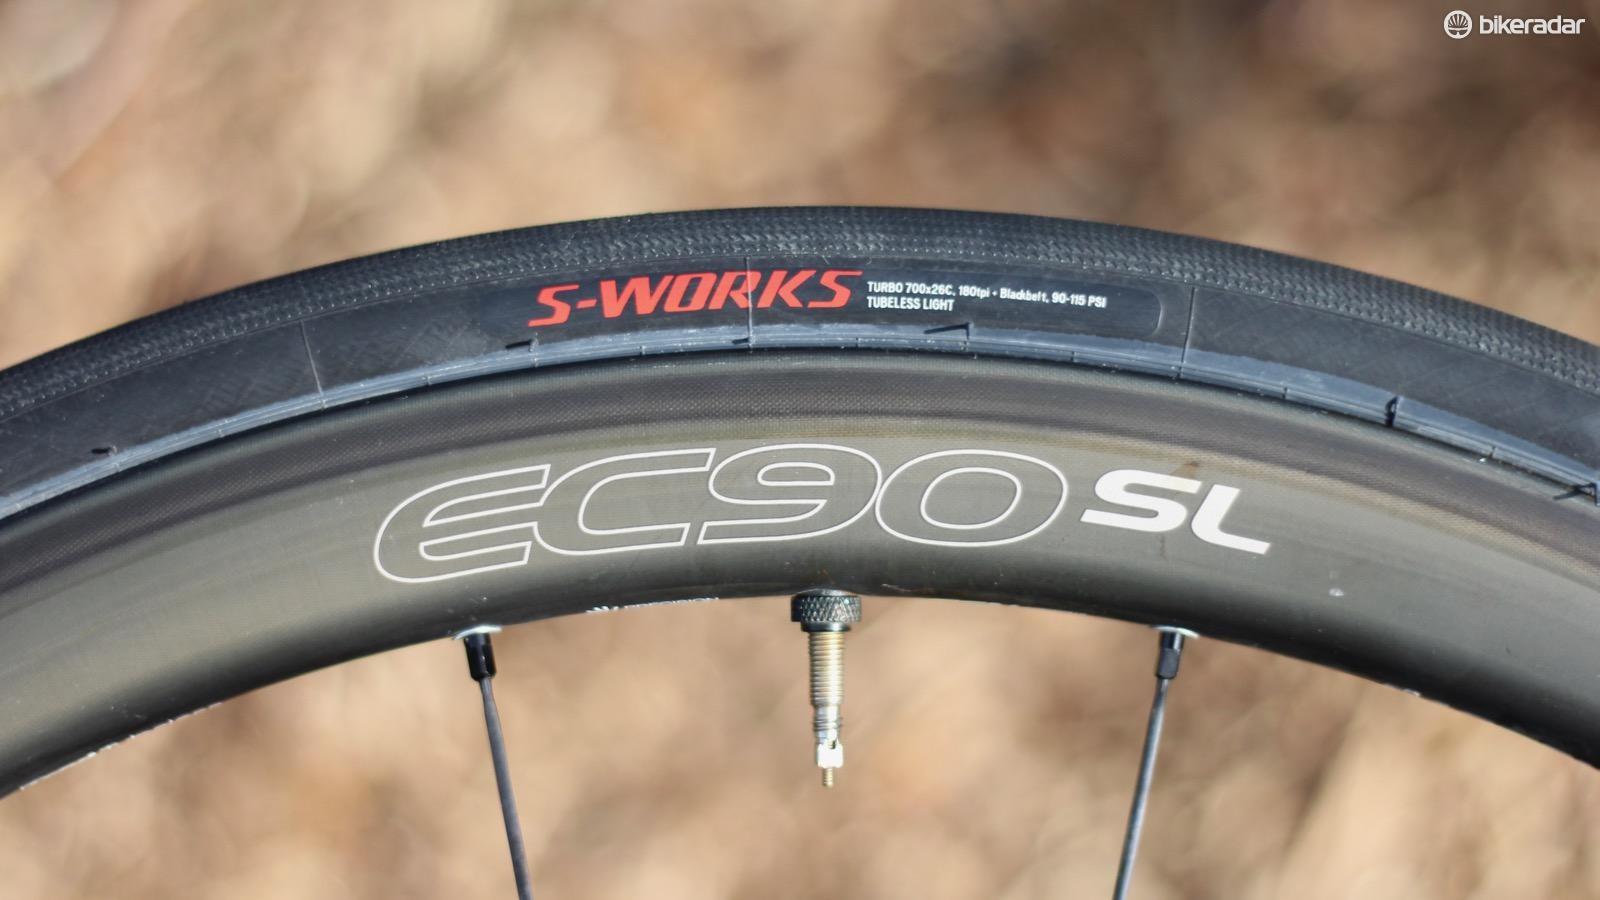 road-tire-test-5-1486070698660-c39c1t2n0ulv-06d77f8